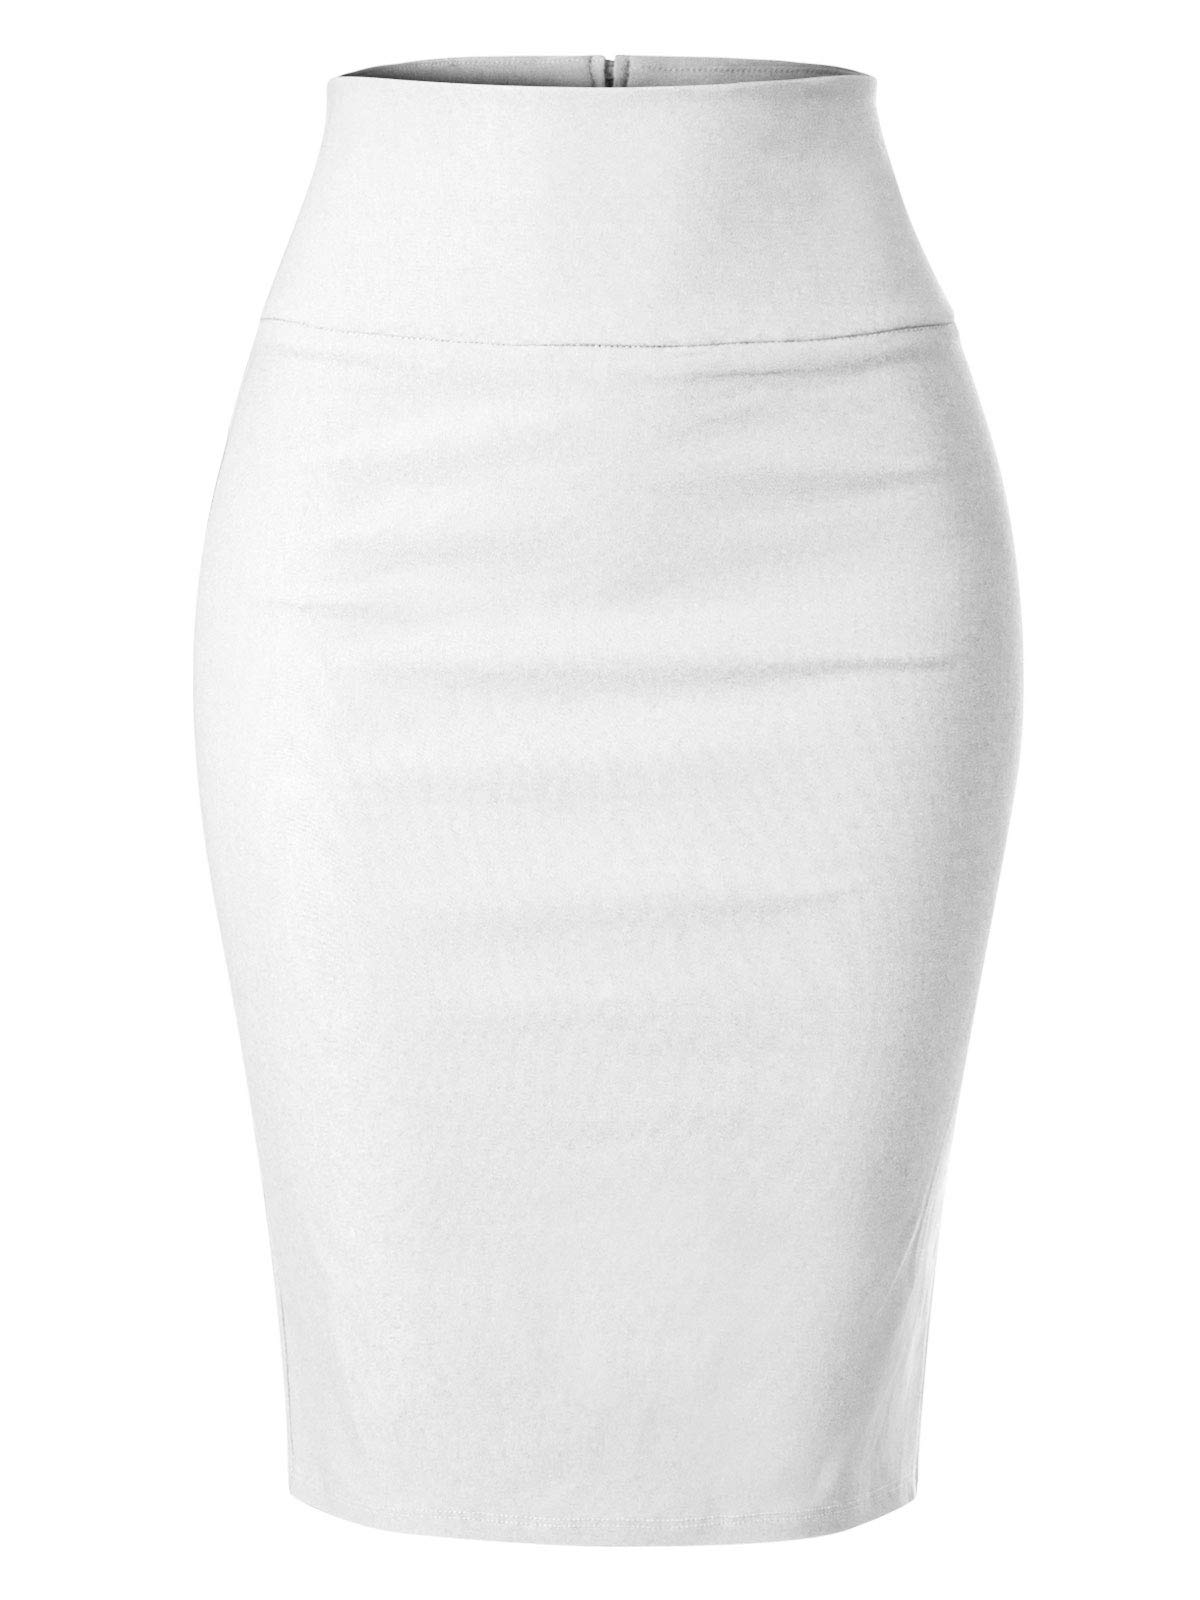 MixMatchy Women's Stretch Office Knee Length Midi Pencil Skirt White 3XL by MixMatchy